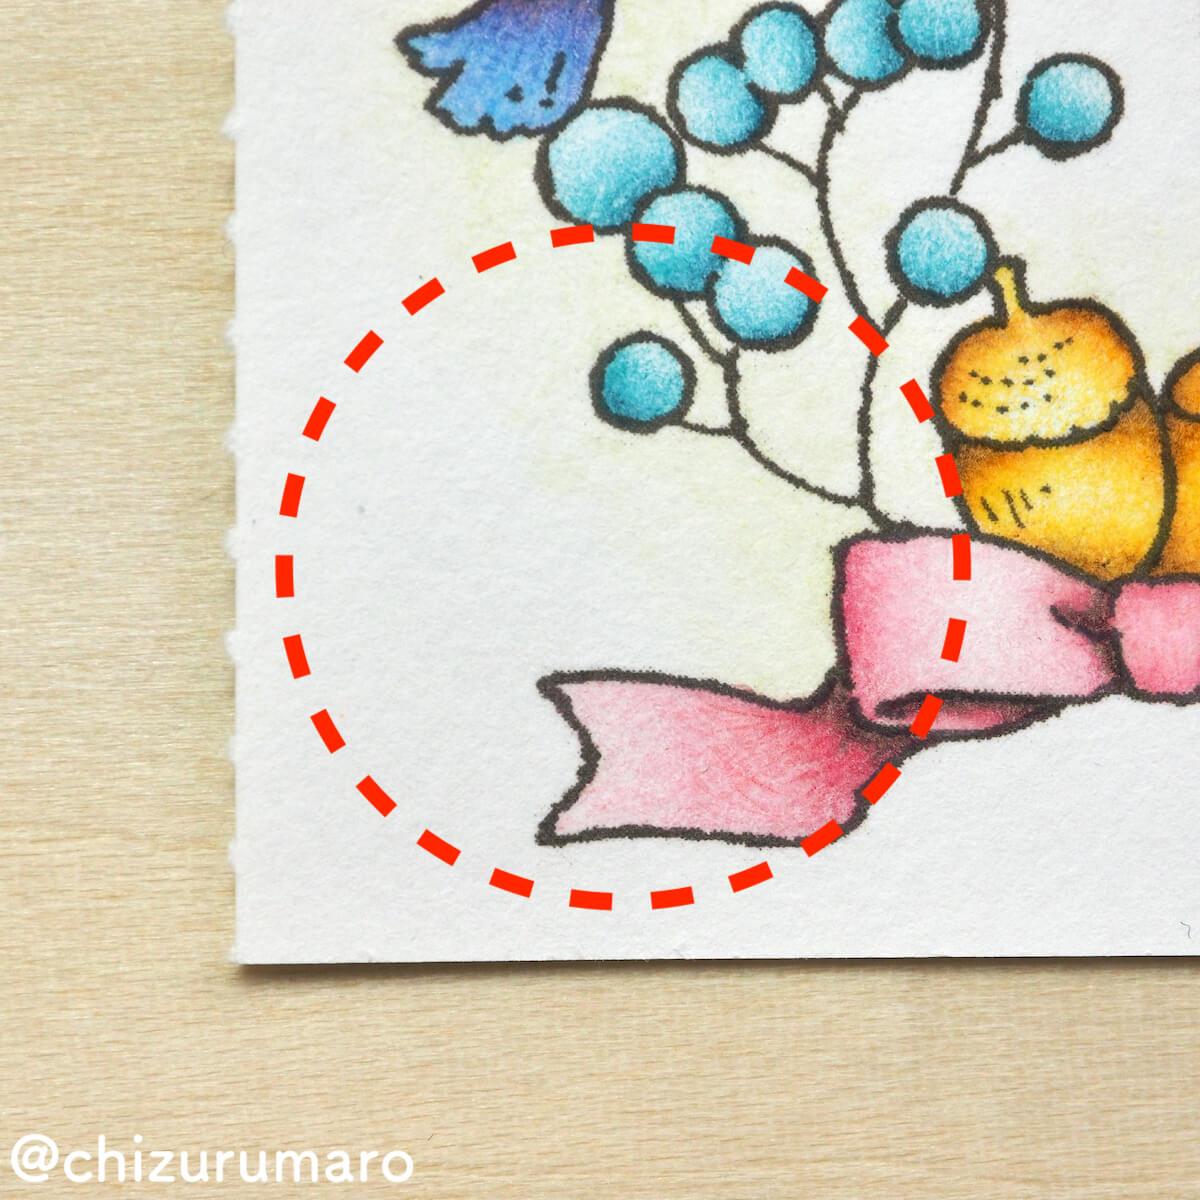 f:id:chizurumaro:20200227212140j:plain